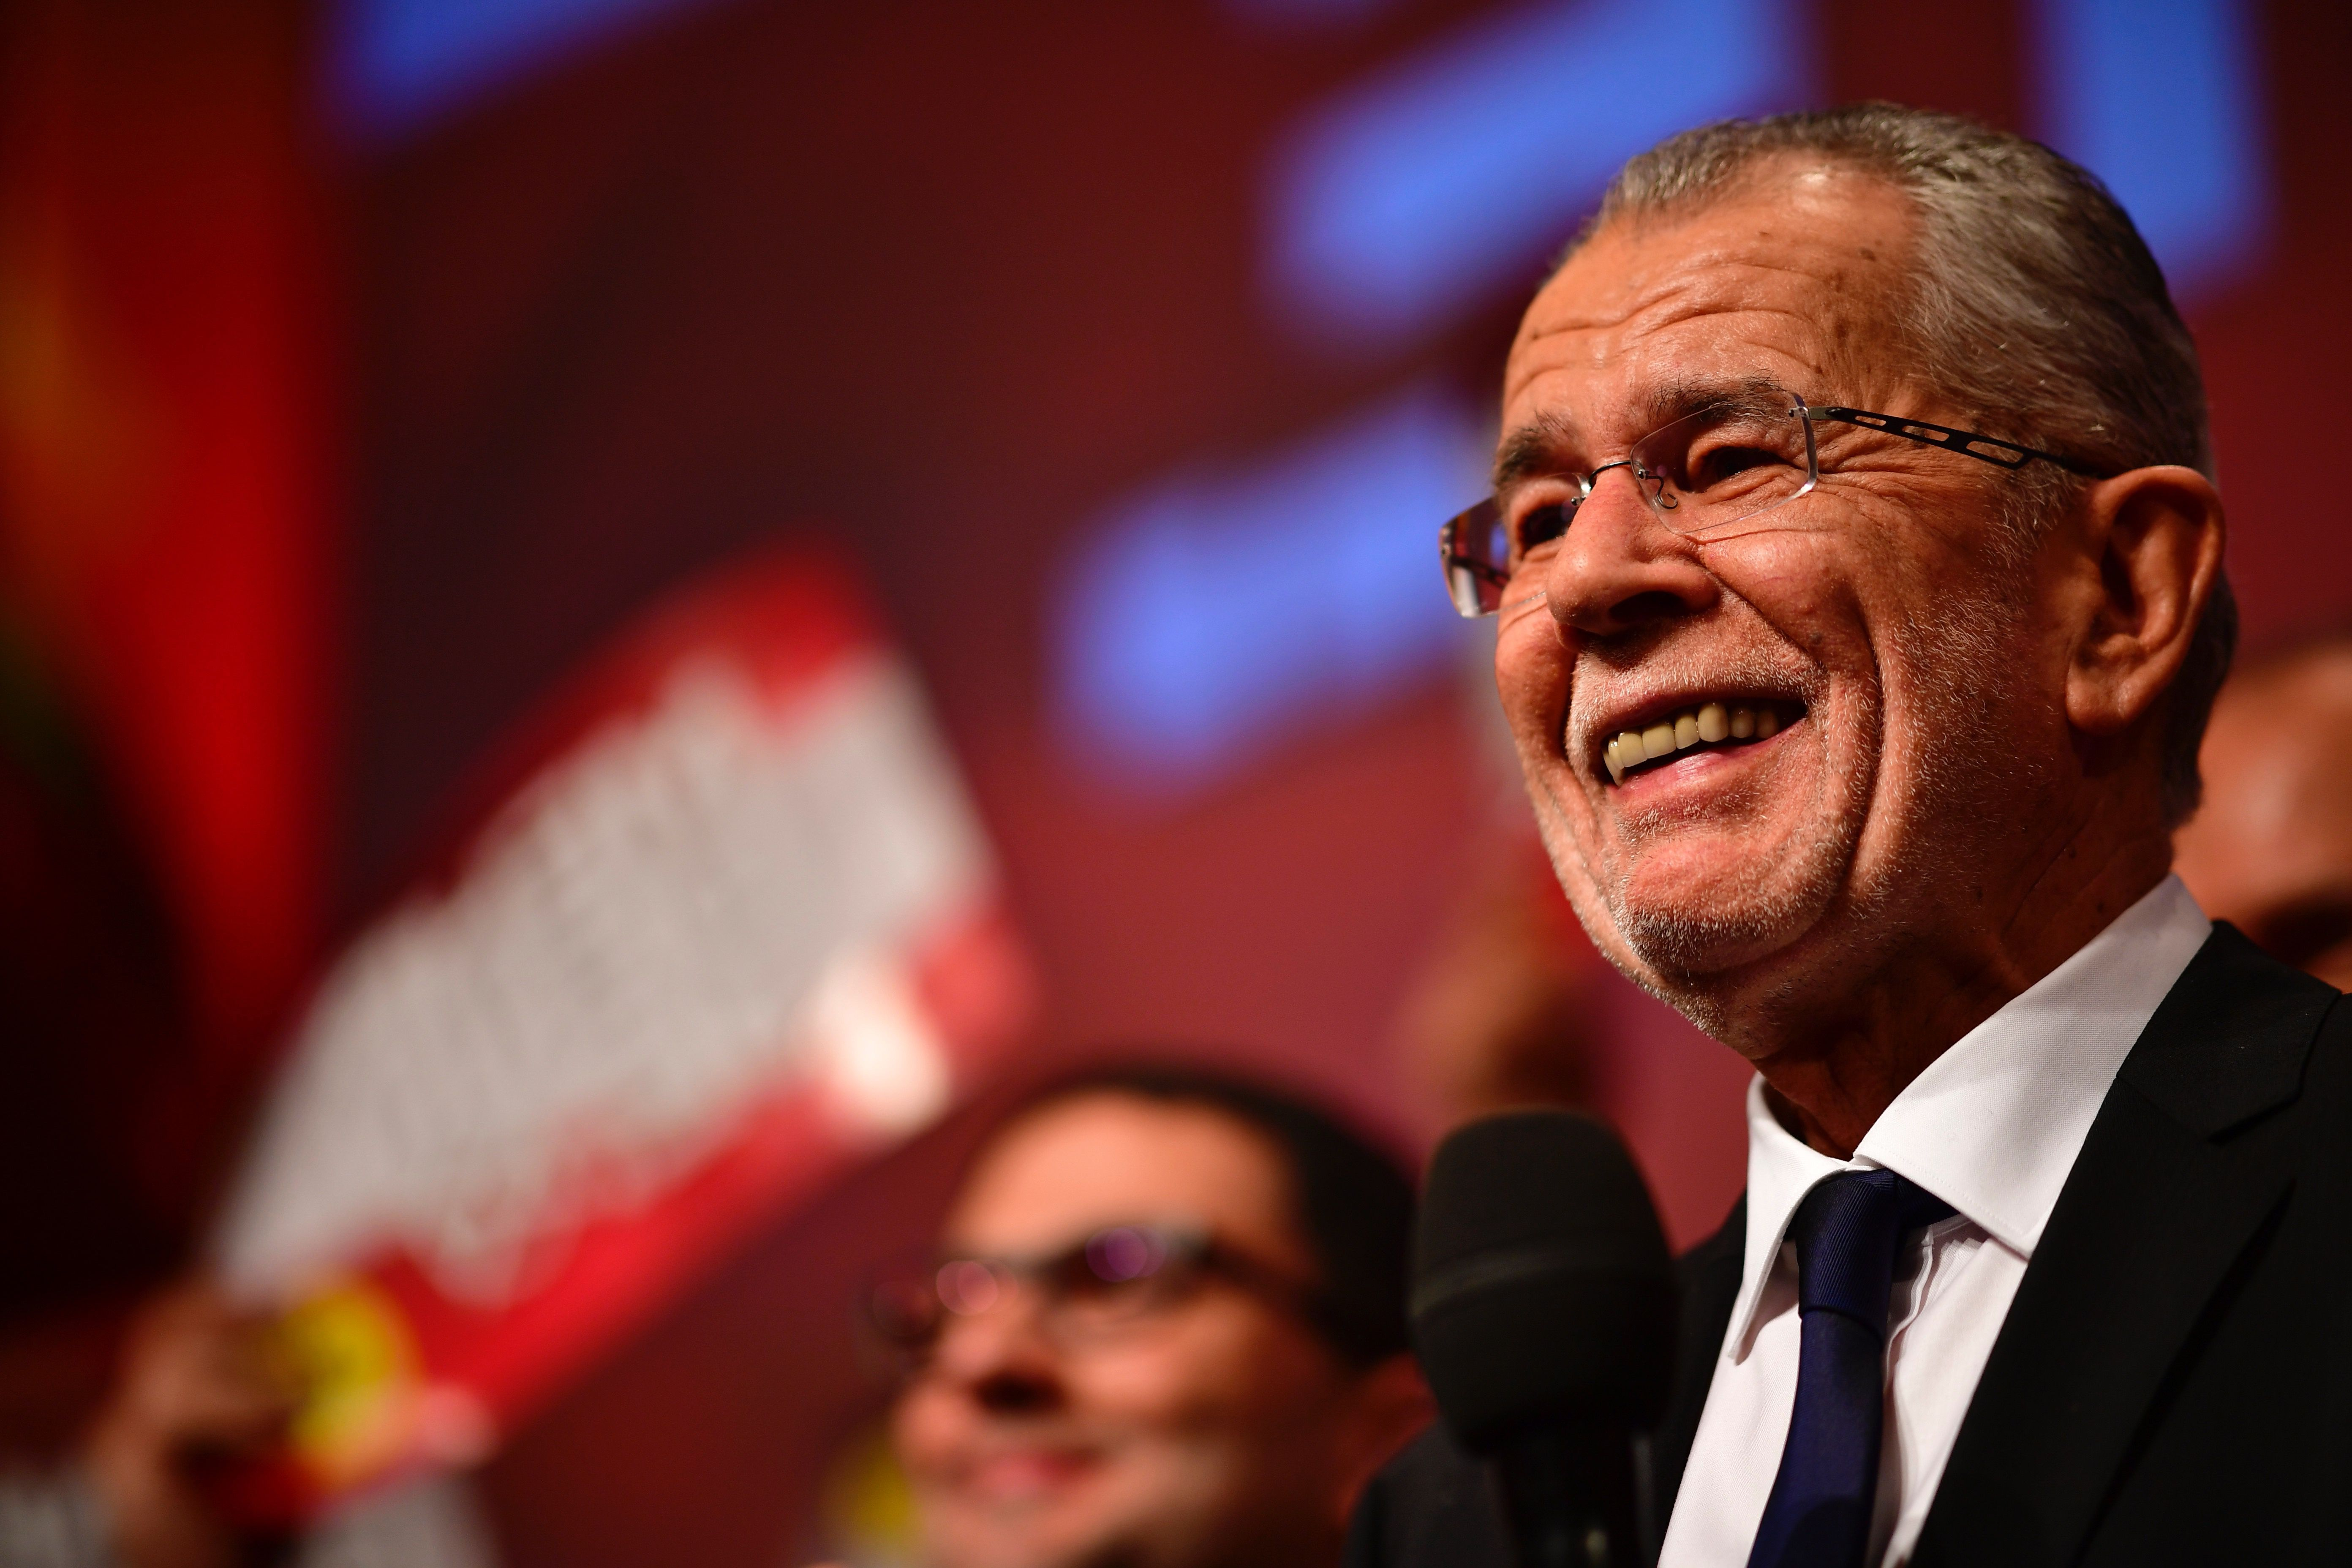 Alexander Van der Bellen celebrates his victory in the Austrian presidential election.